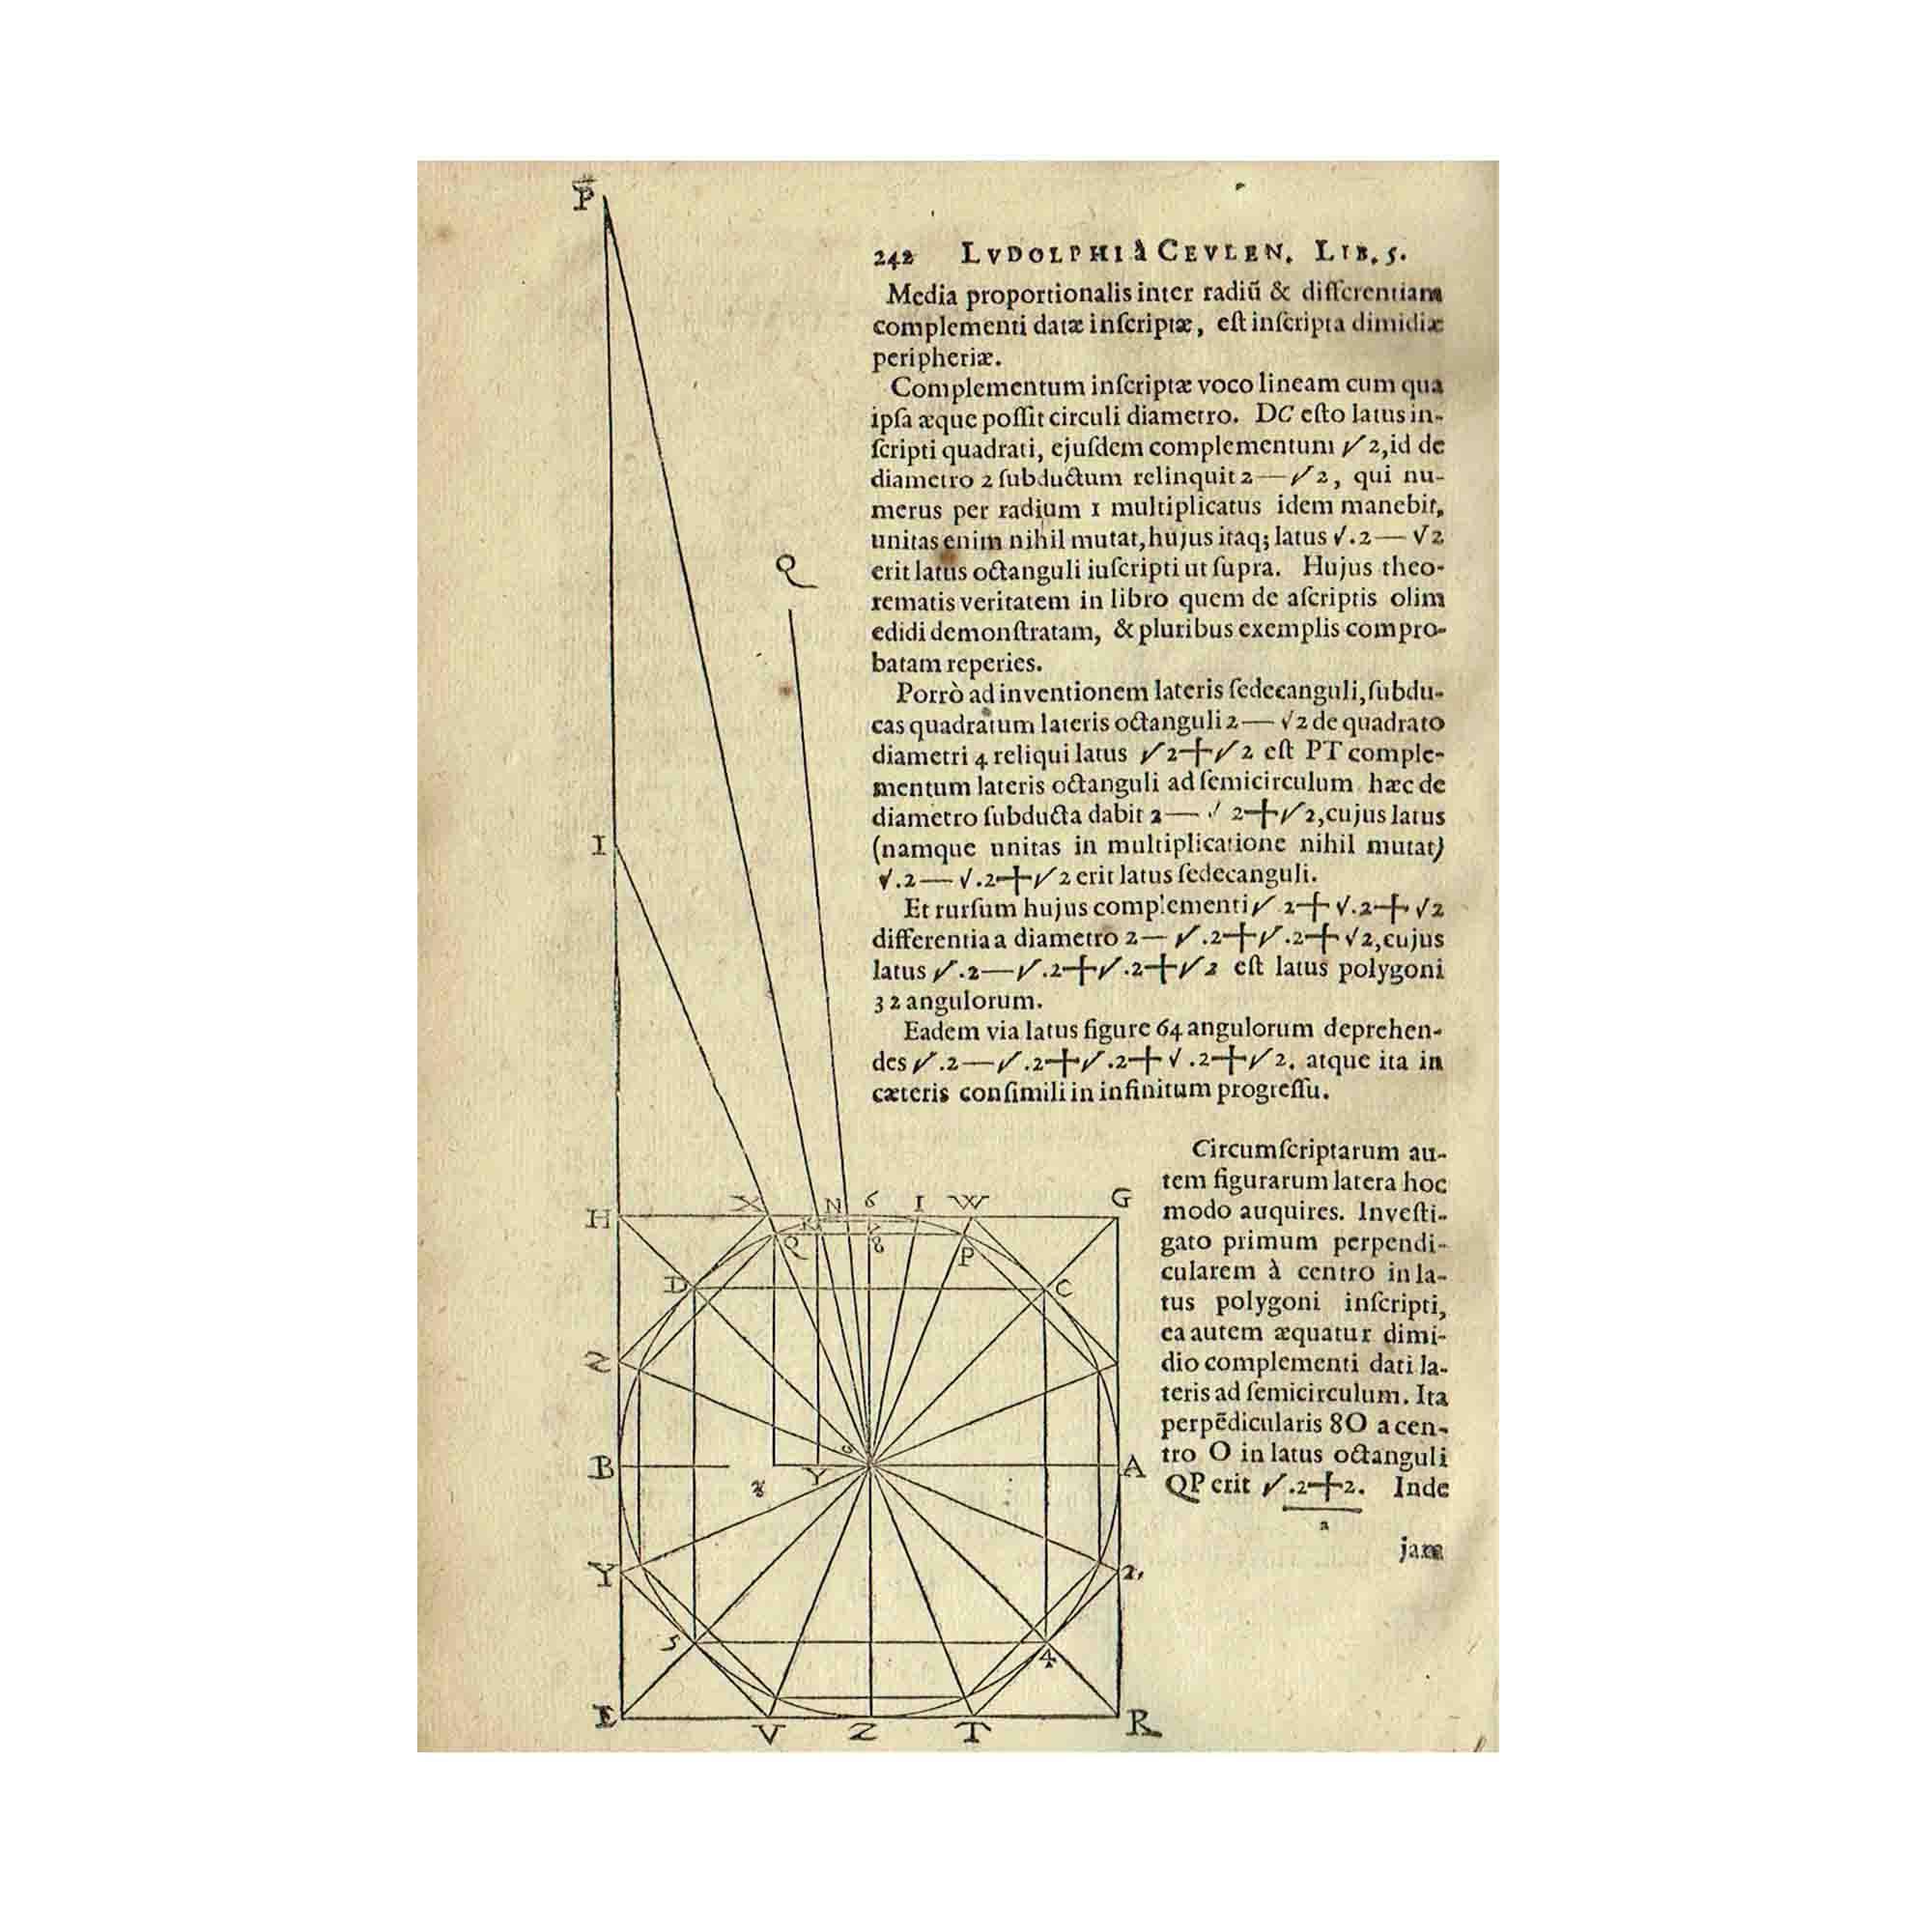 Ceulen-Fundamemta-arithmetica-1615-2-N.jpeg